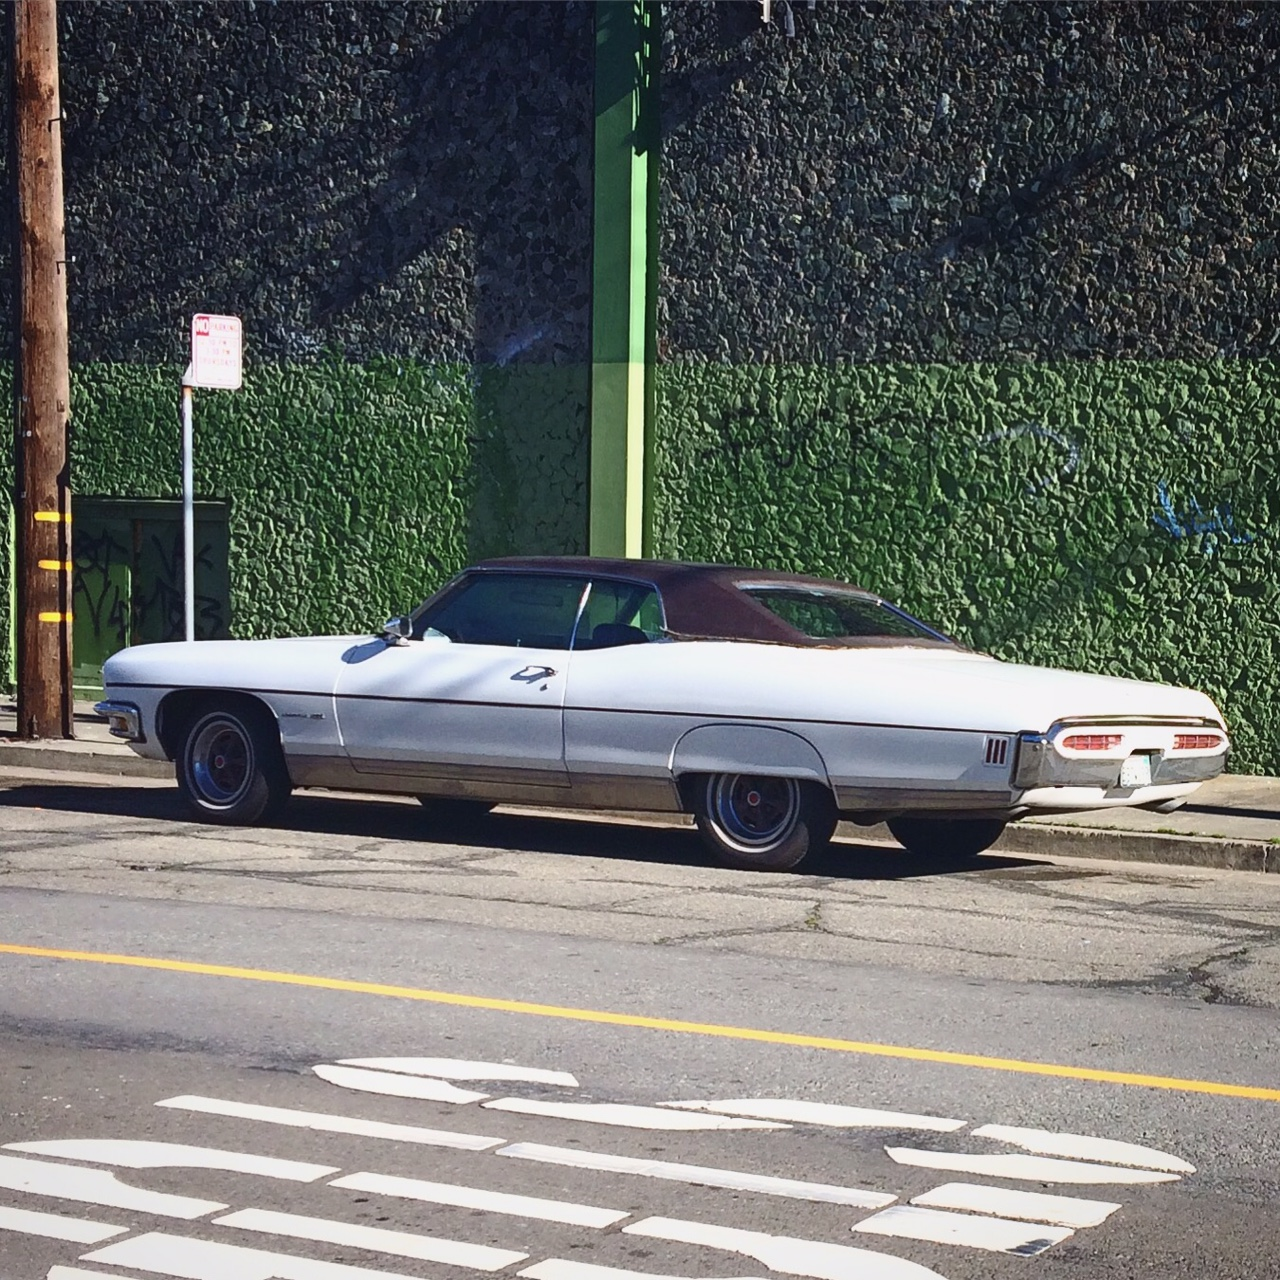 Found In Ralph Bunchie Oakland California 1970 Pontiac 1960 Bonneville Station Wagon 455 Hardtop Coupe Dynamic Drive